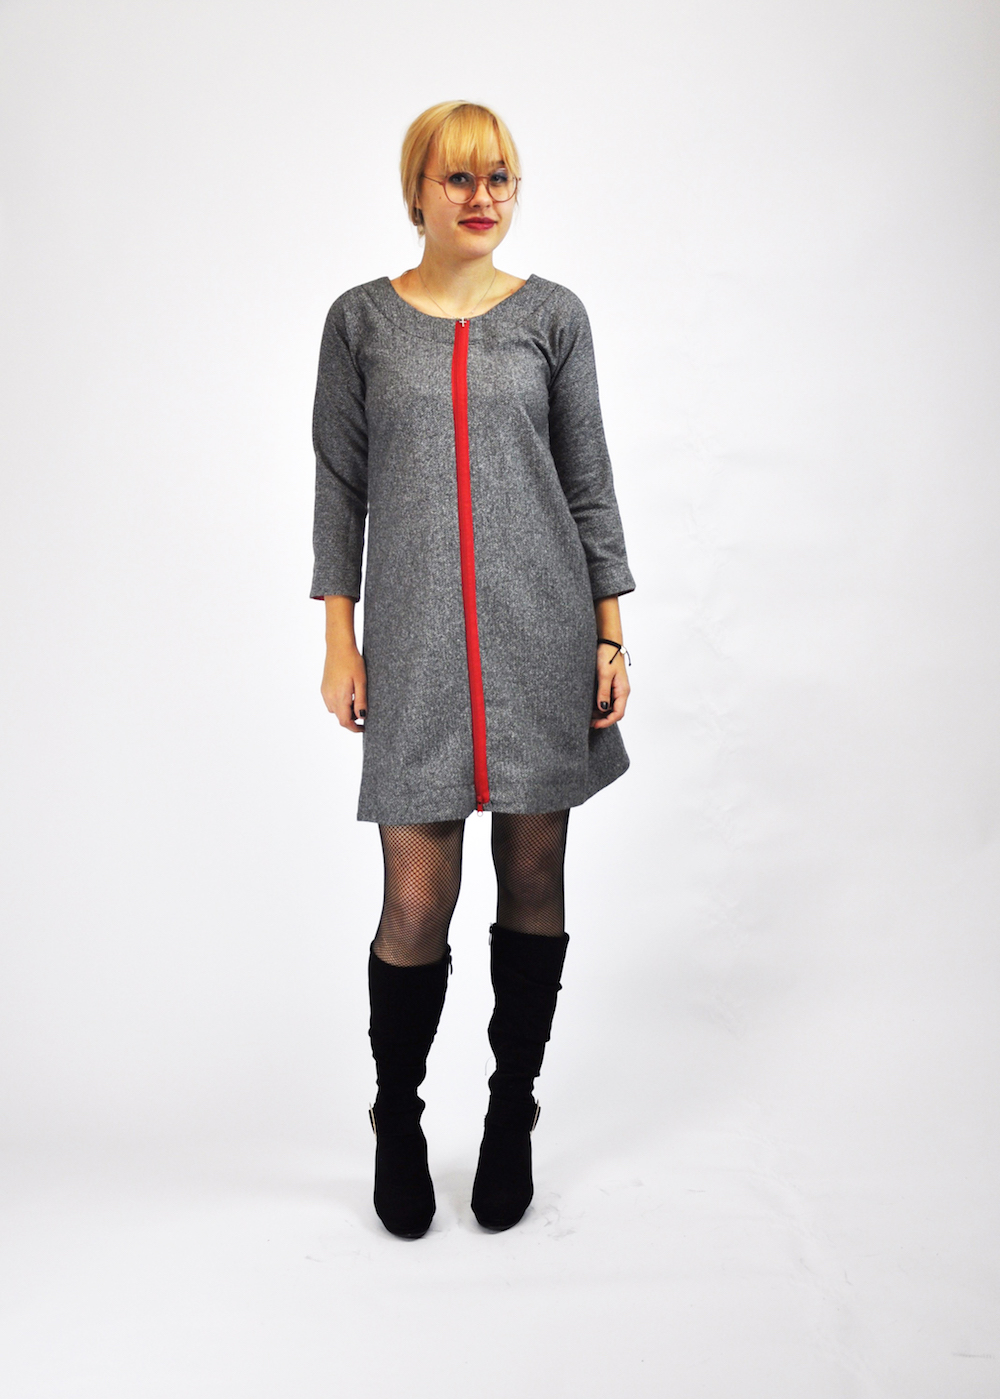 Kleid Hetty, Bild so! pattern